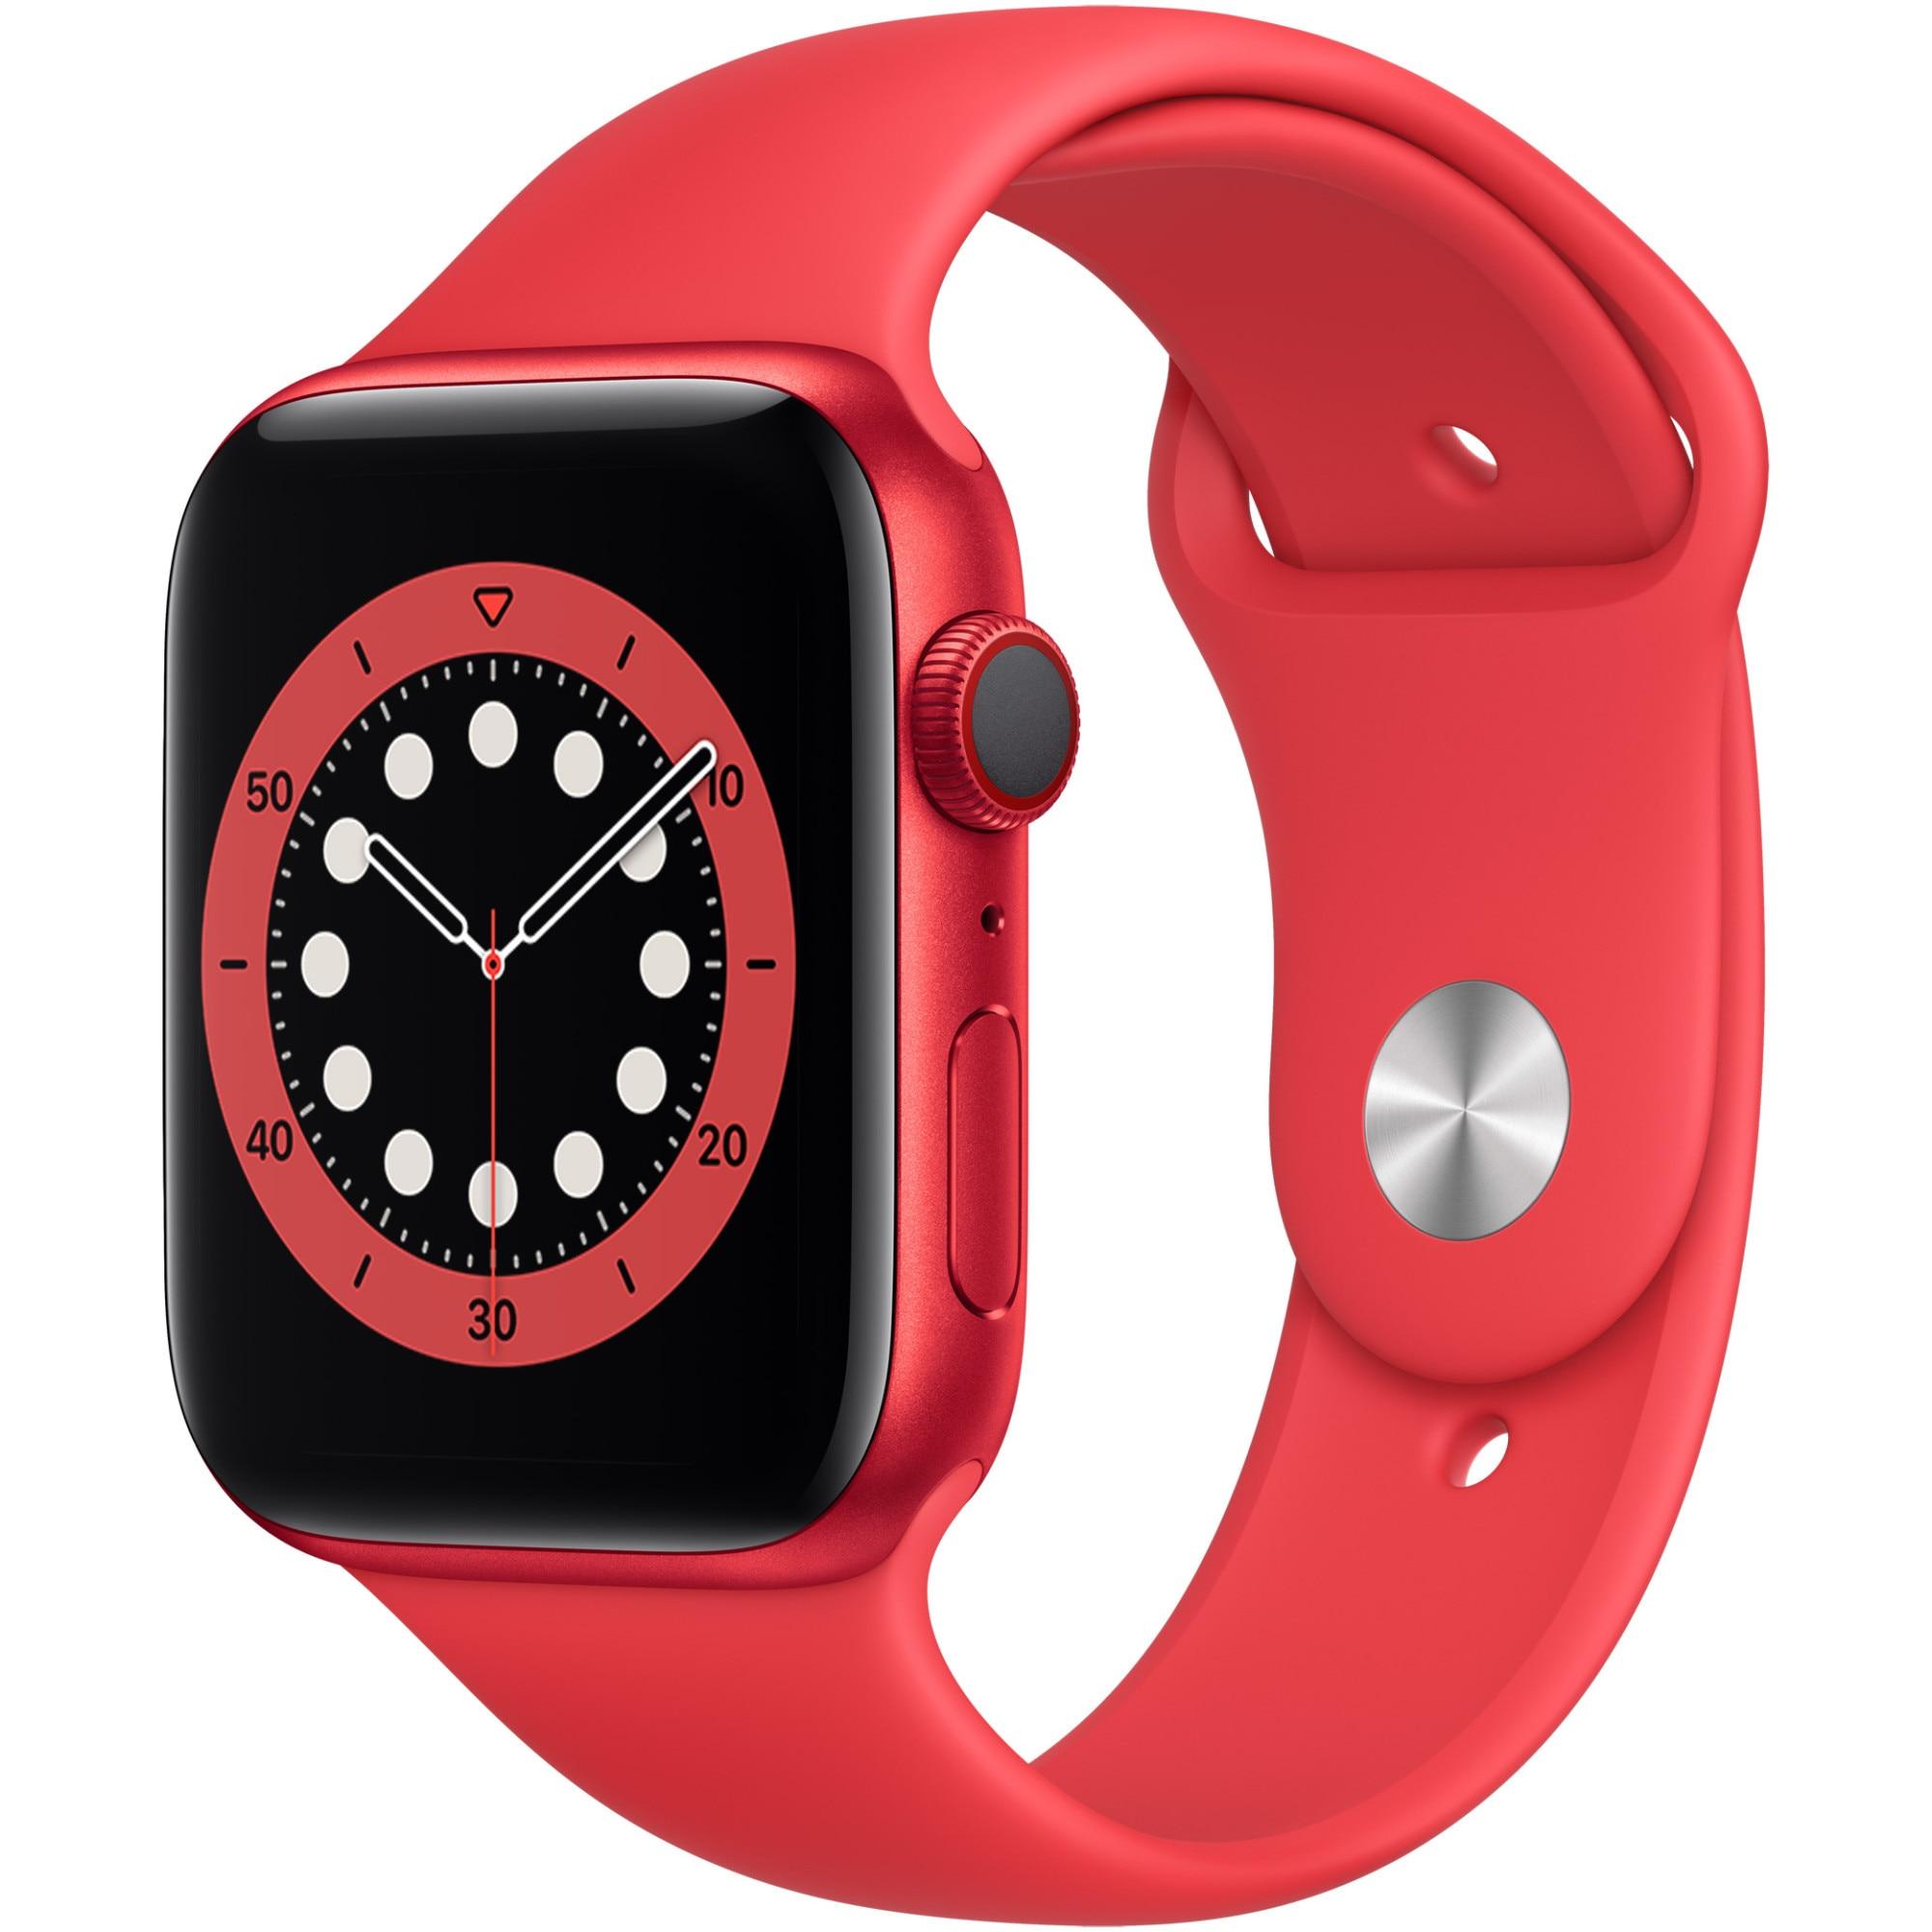 Fotografie Apple Watch 6, GPS, Cellular, Carcasa Red Aluminium 44mm, Red Sport Band